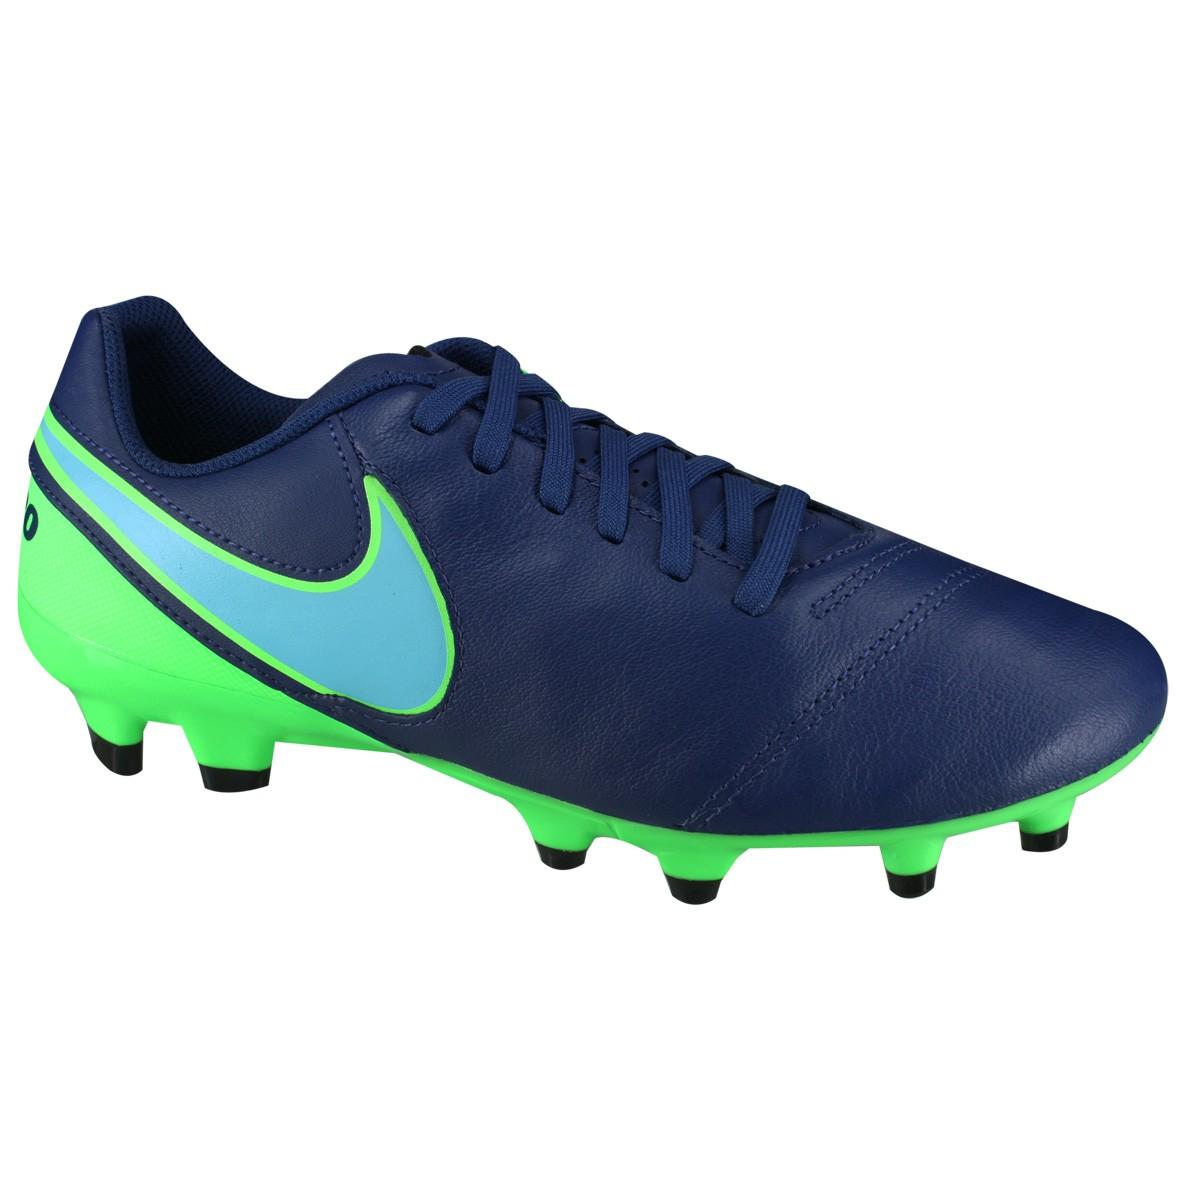 Chuteira Nike Tiempo Genio II Leather FG 819213-443 - Marinho Verde ... 79b21739f516a